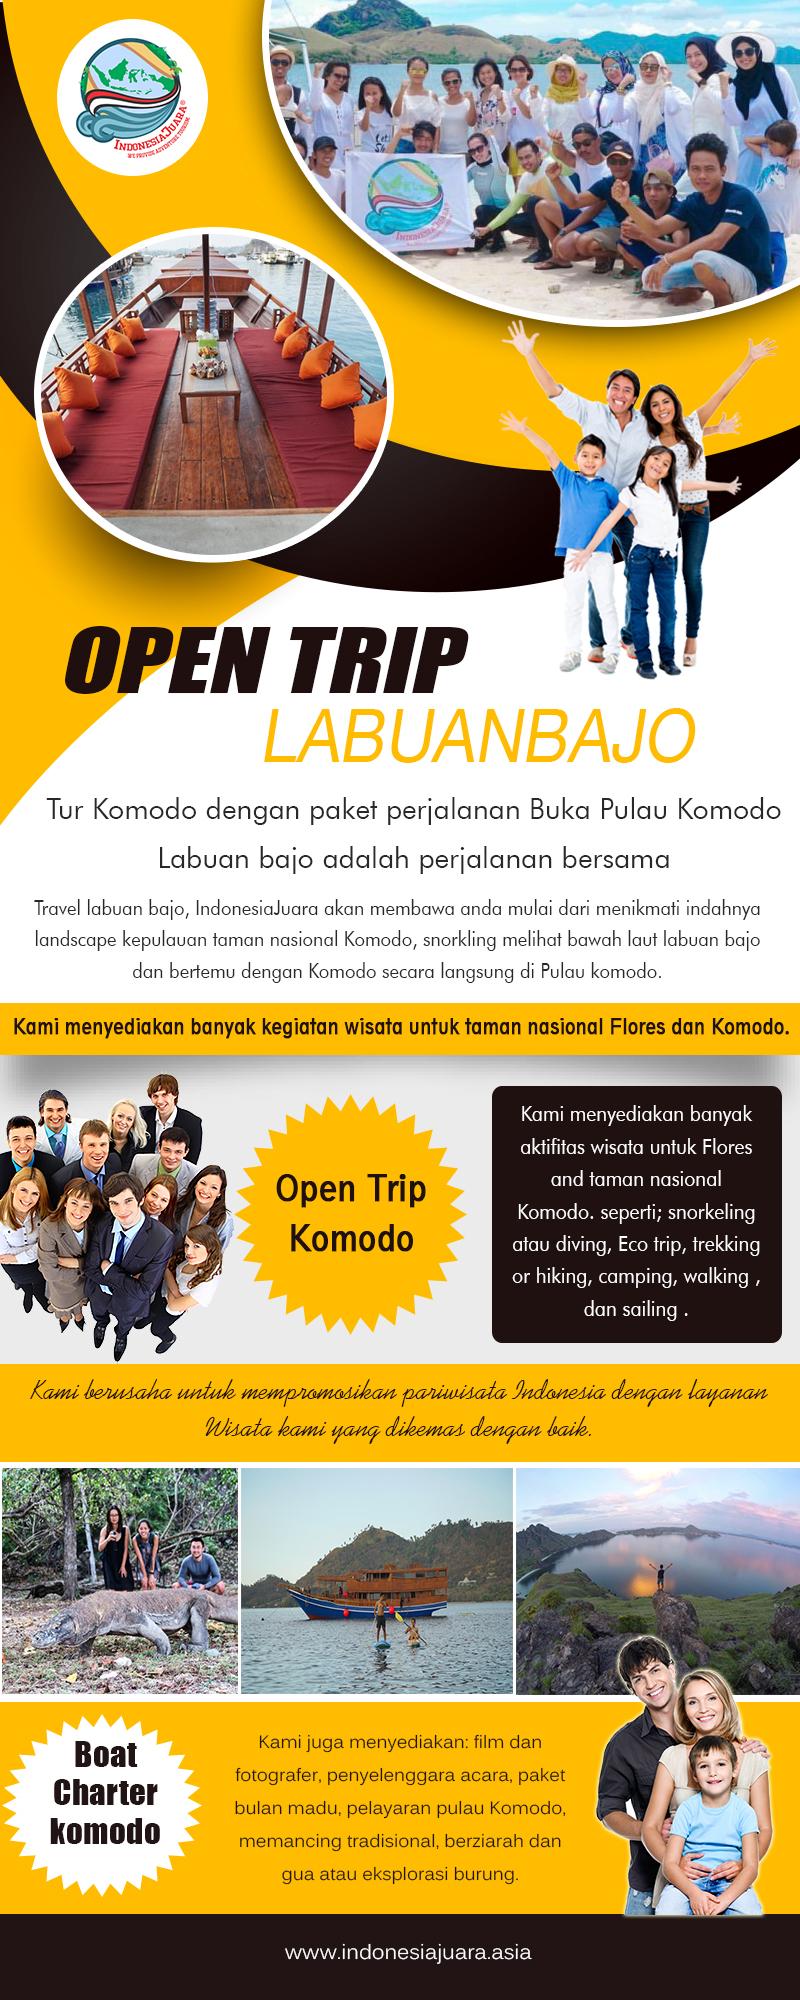 Open Island Trip | indonesiajuara.asia